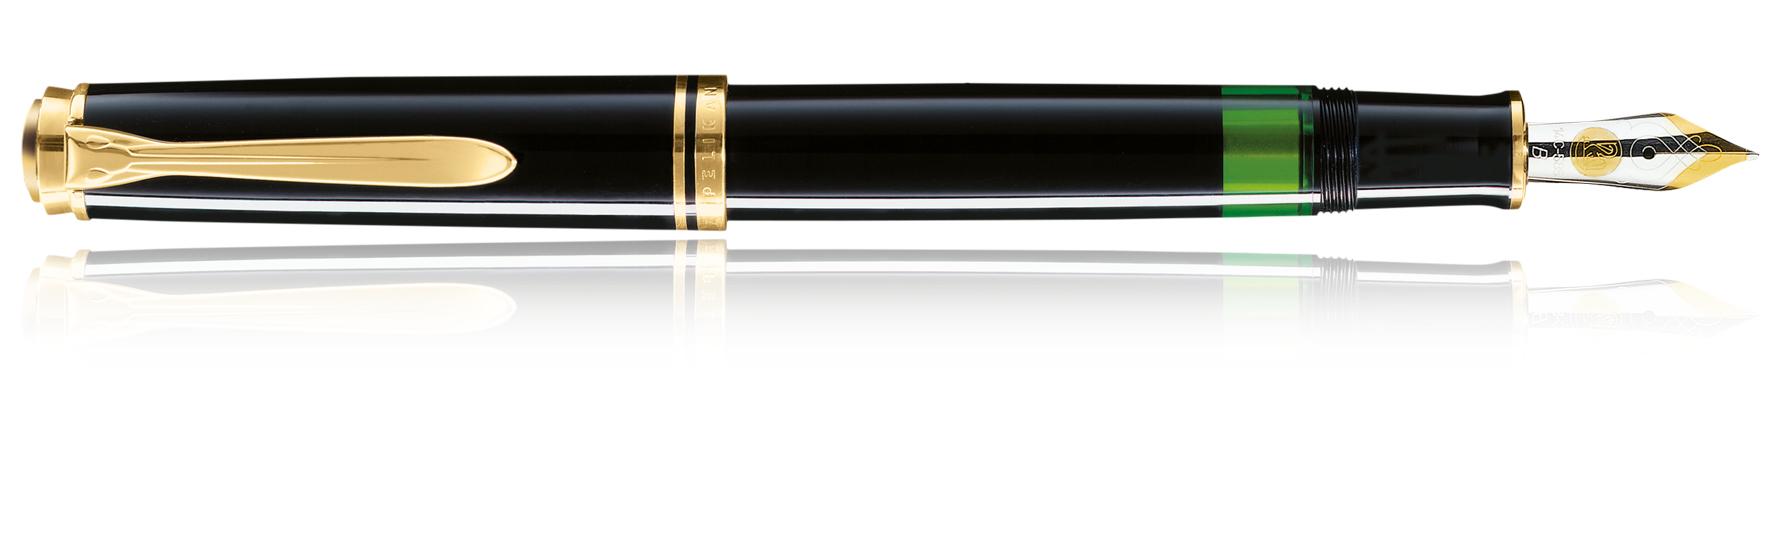 Pelikan Souverän M400 - Schwarz - Gold - Blau - Gold - 1 Stück(e)